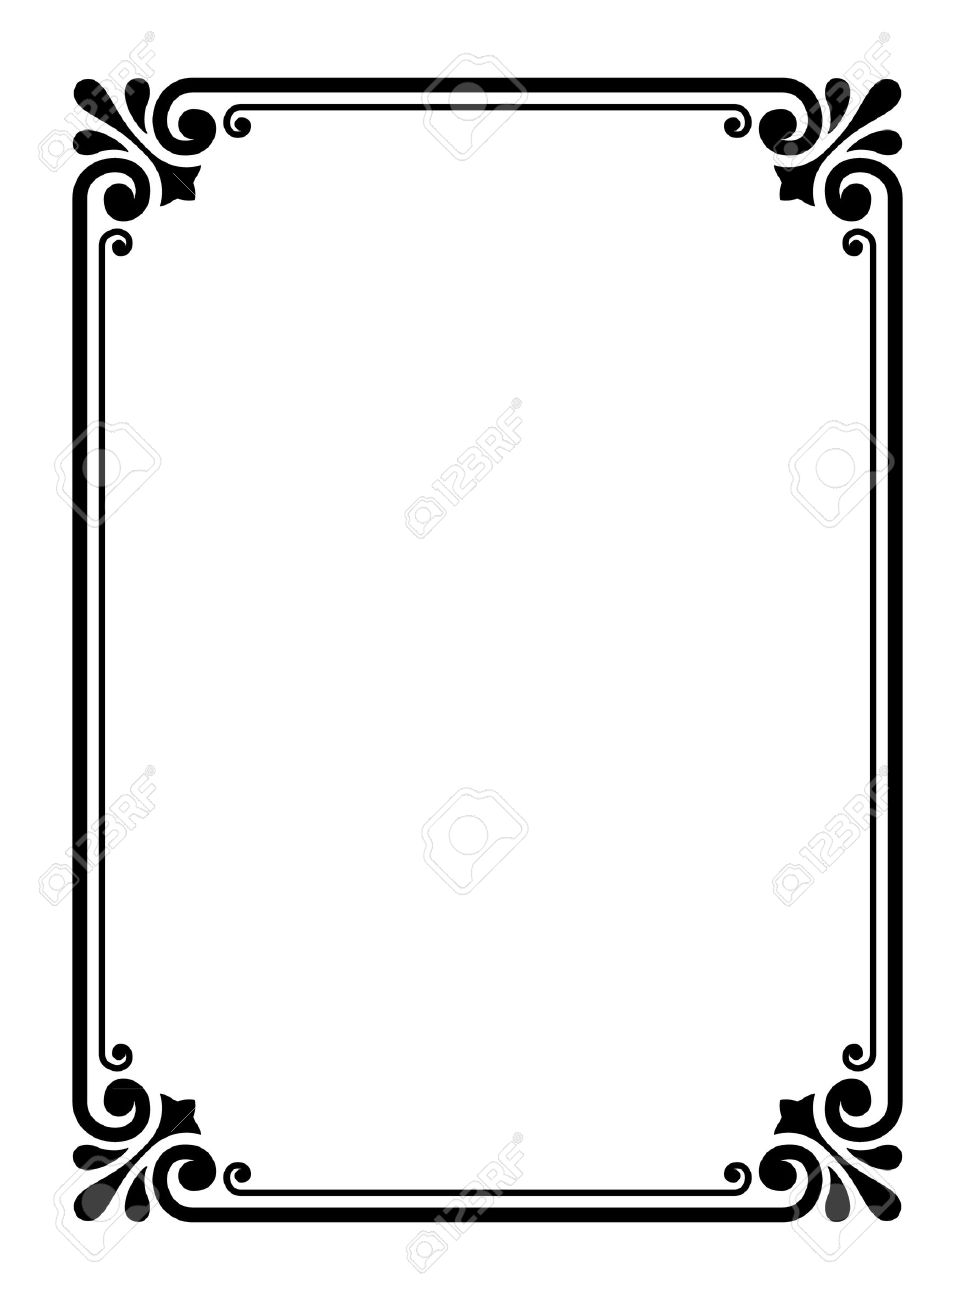 vector simple calligraph ornamental decorative frame pattern royalty rh 123rf com border vector free border vector png